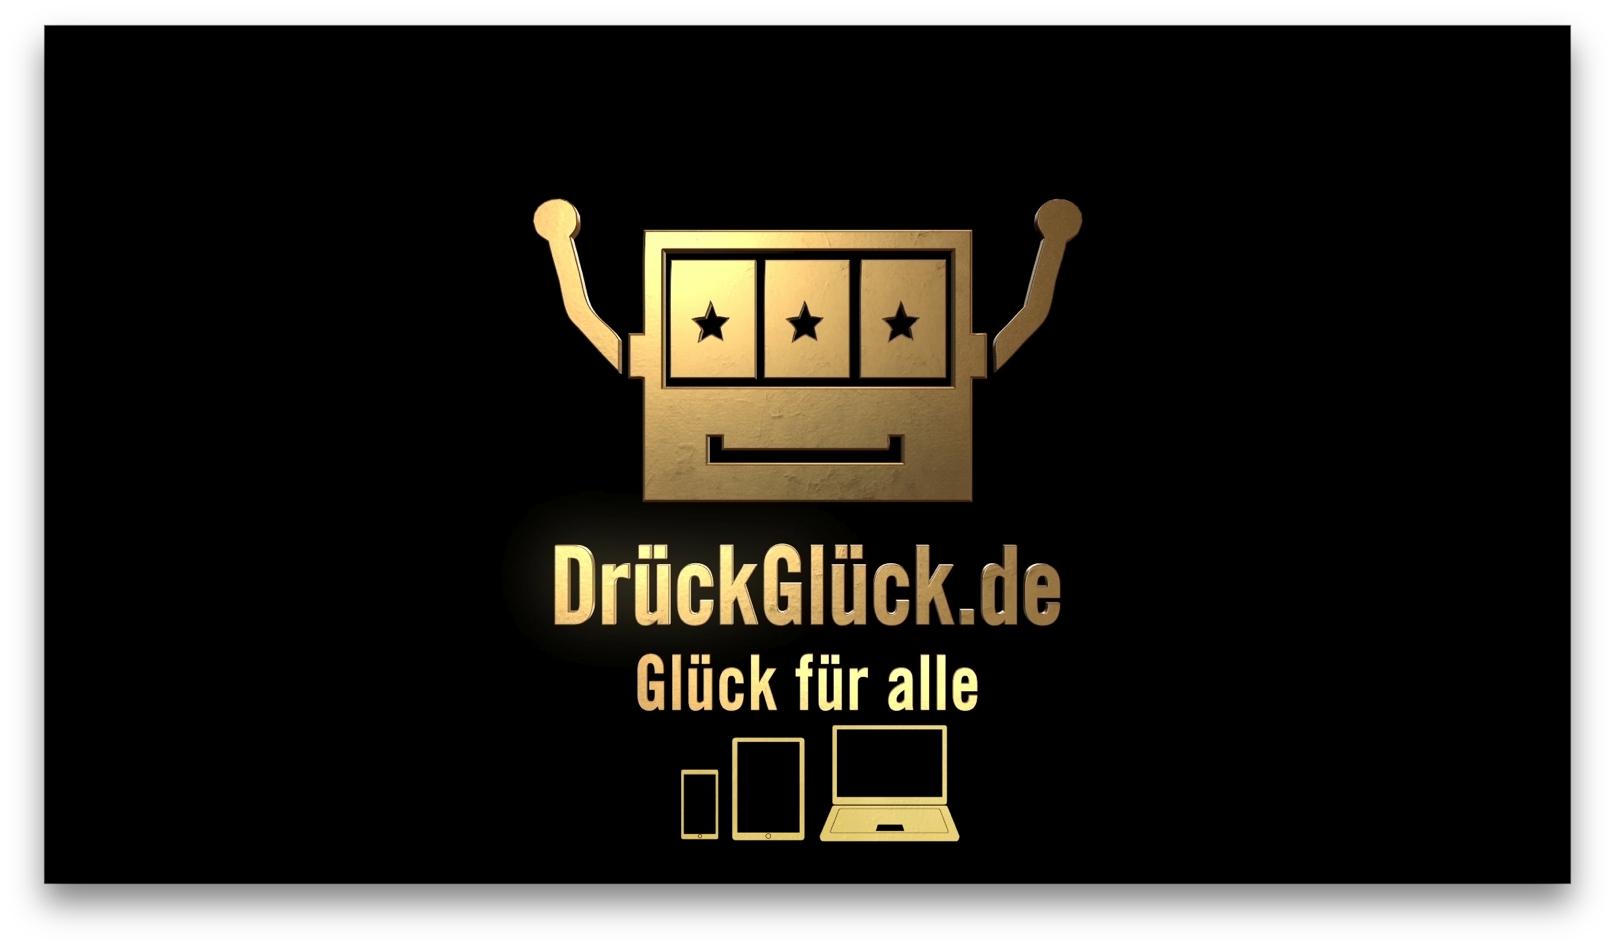 Druckgluck